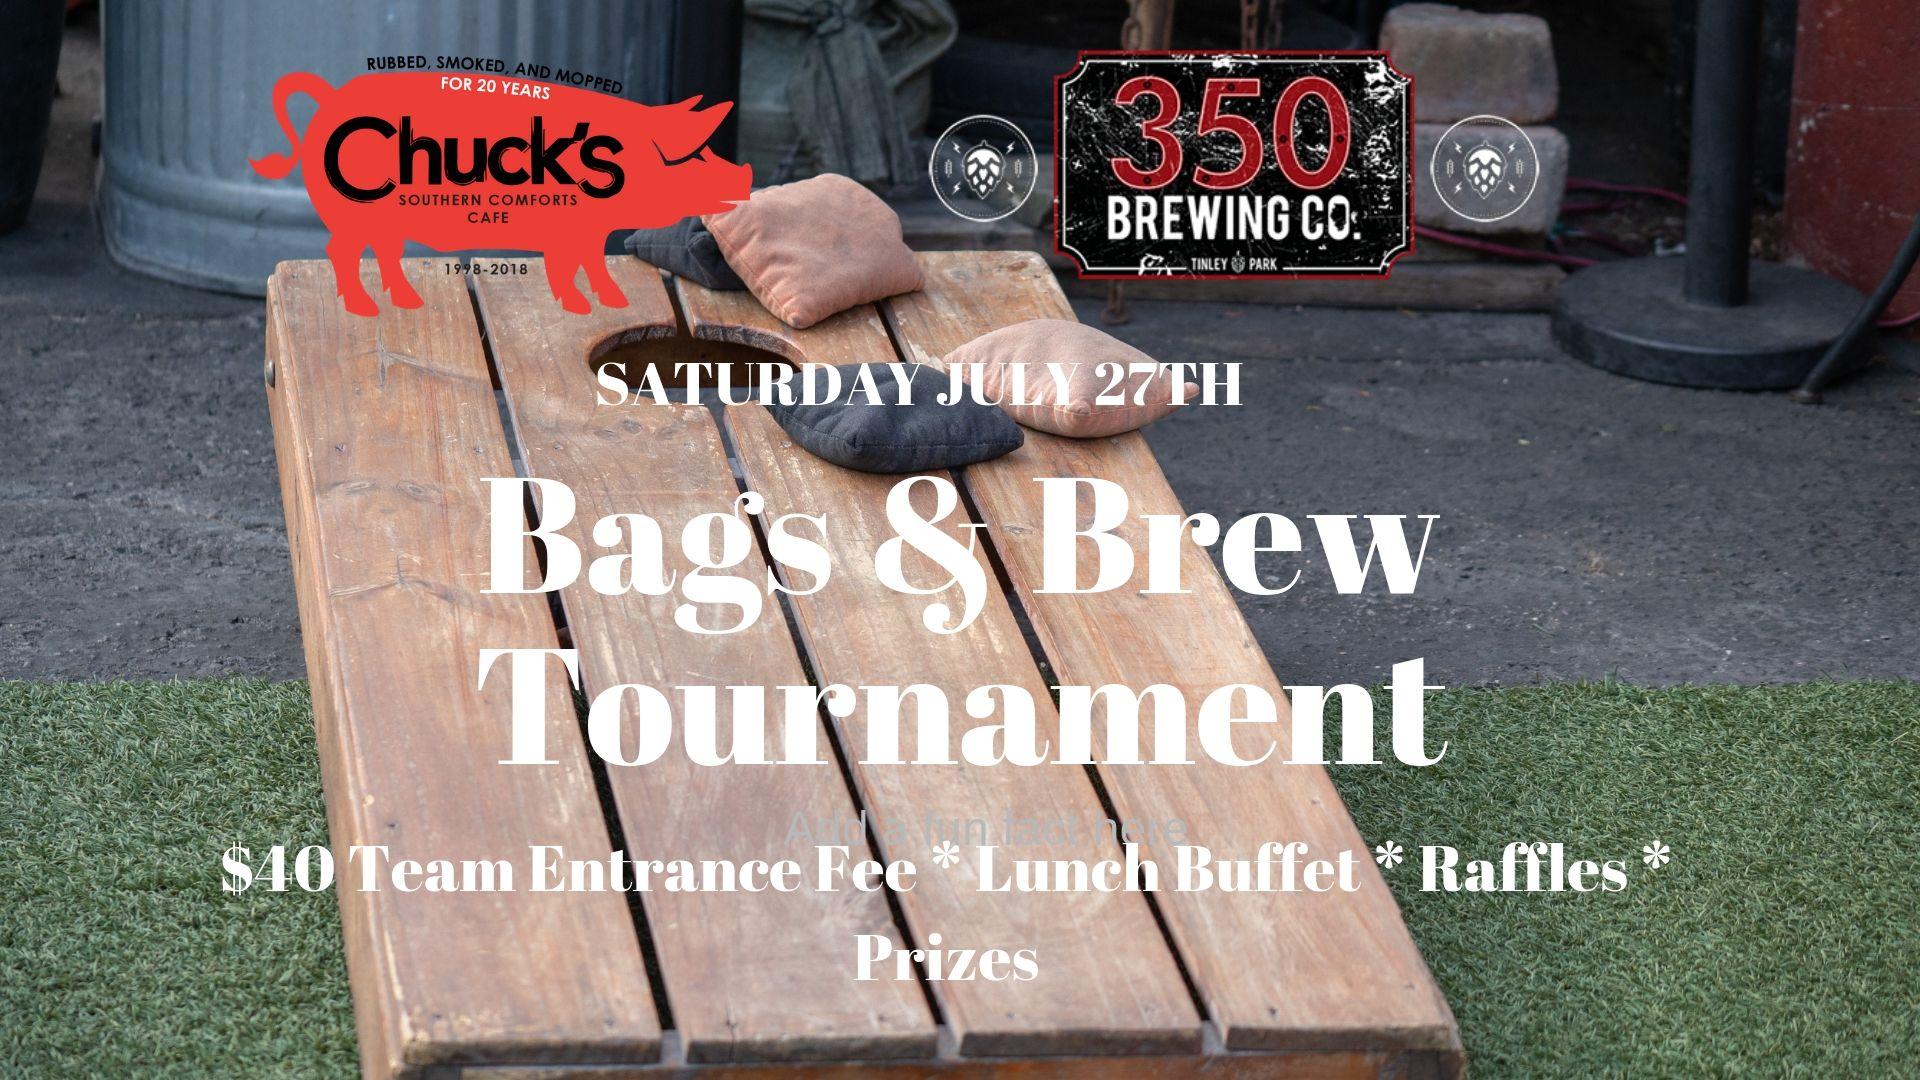 Bags & Brews Tournament Saturday July 27th